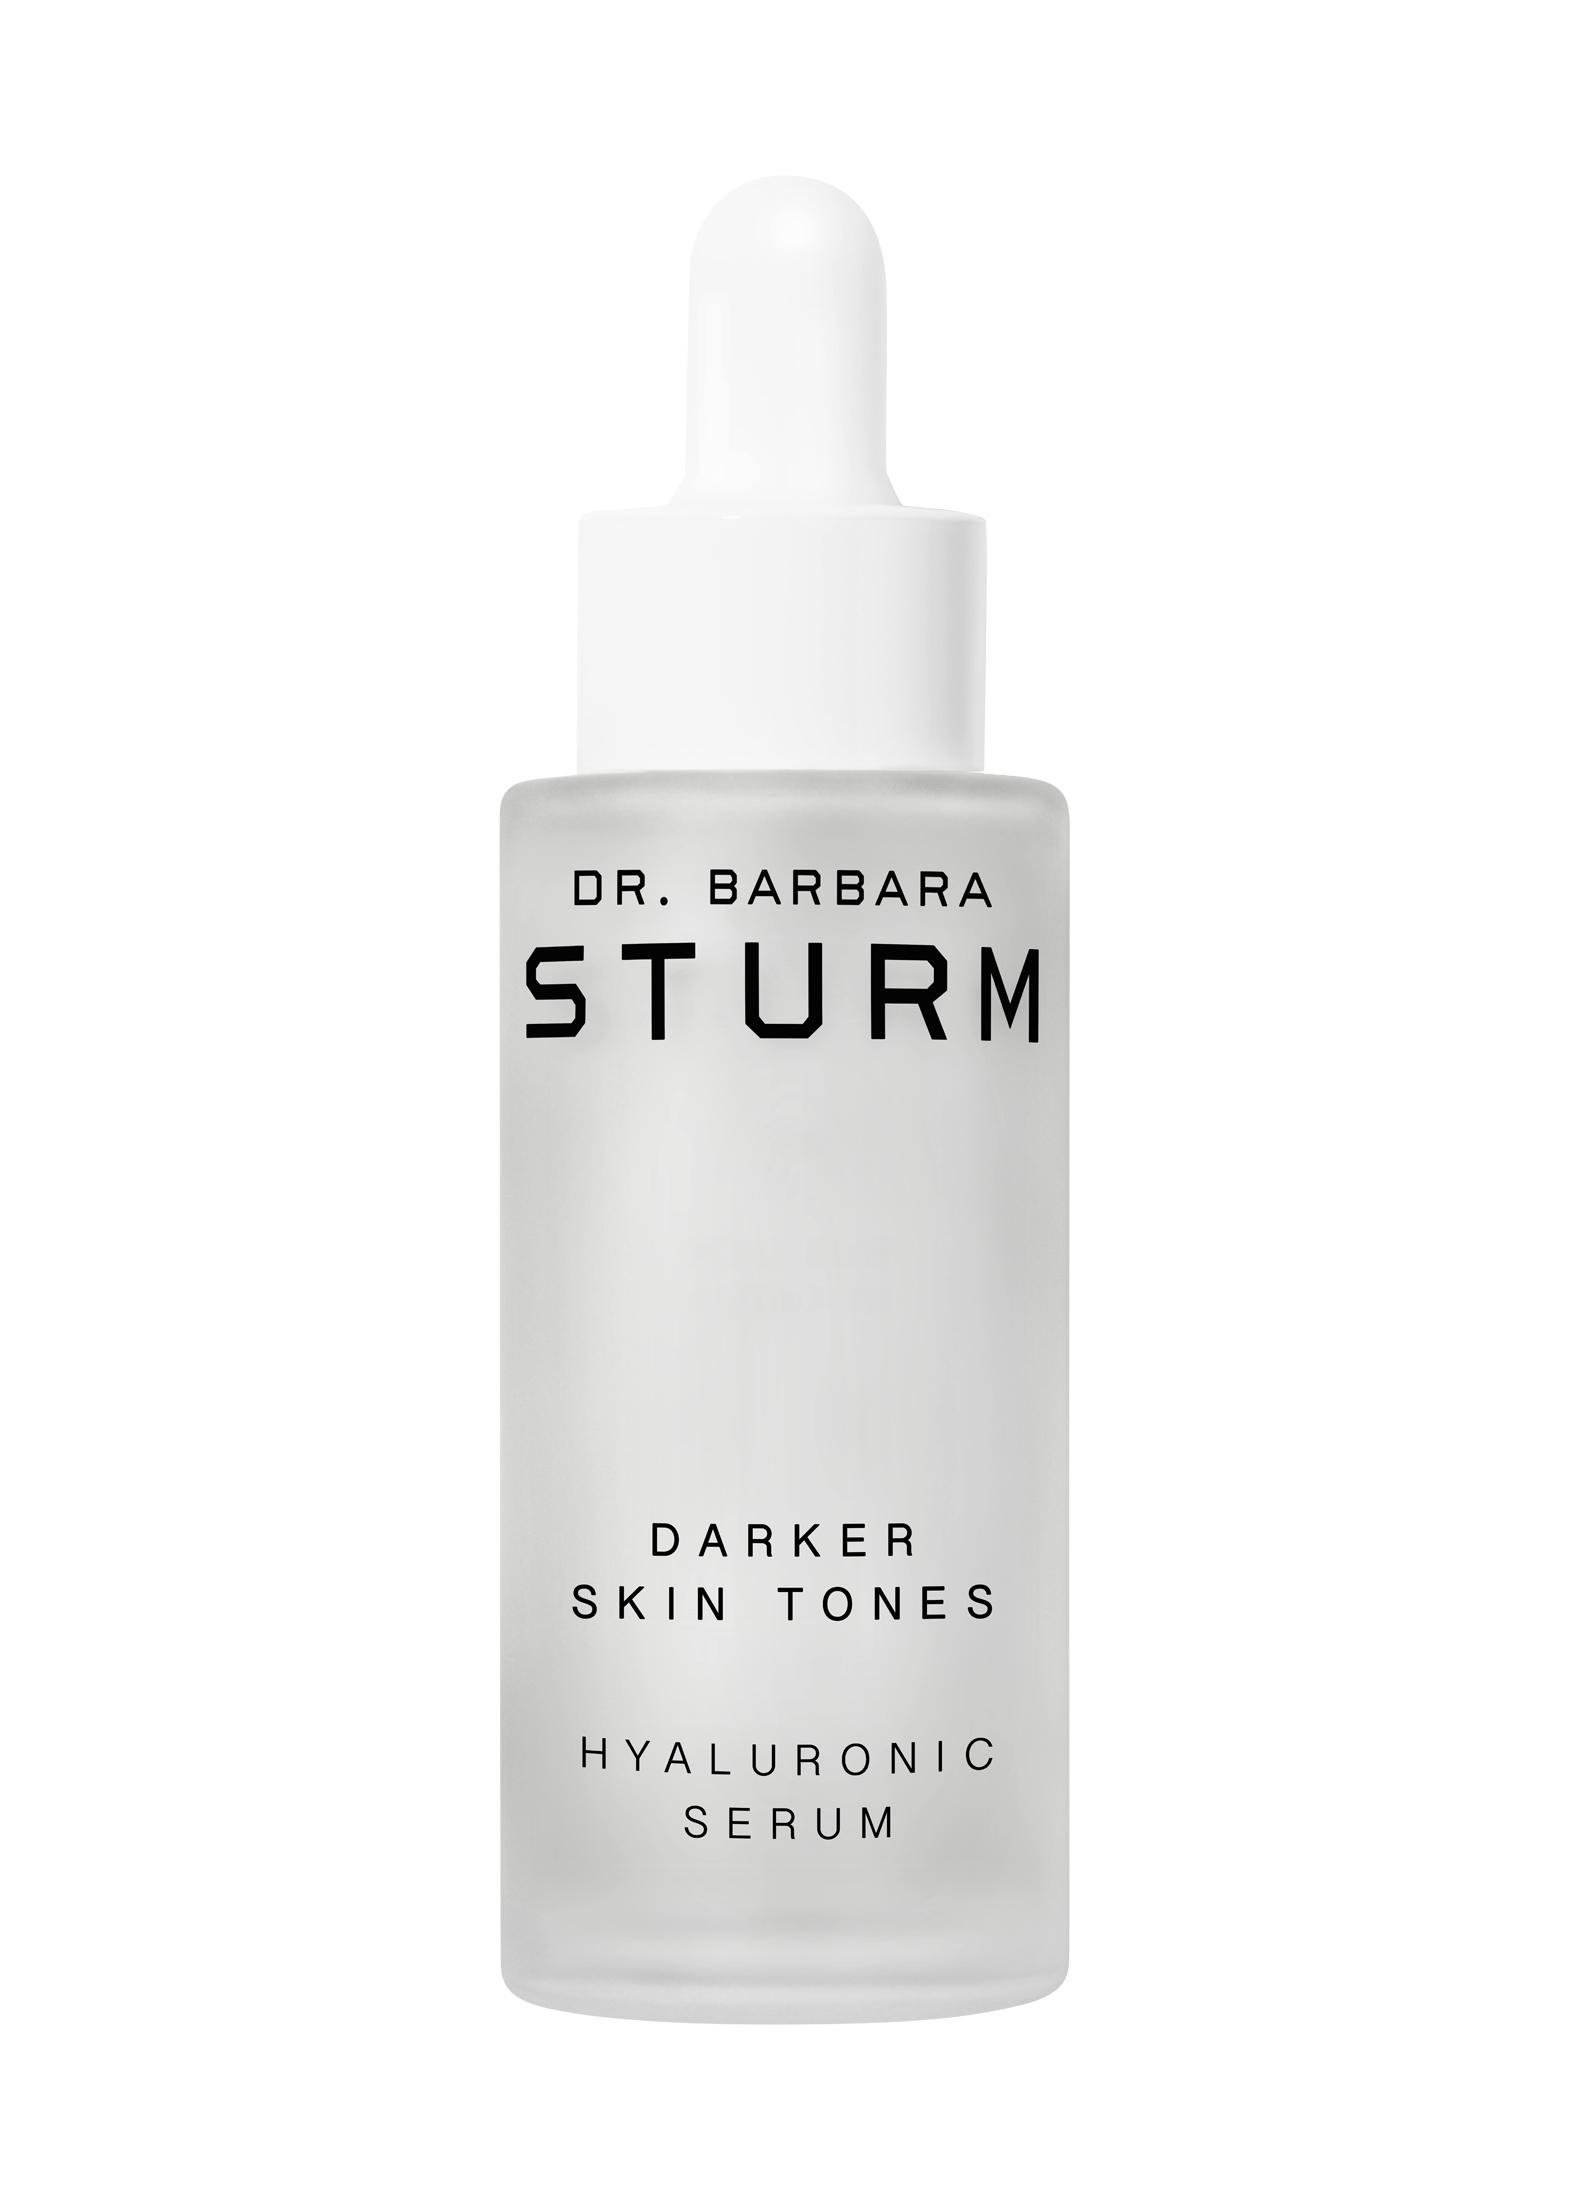 Darker Skin Tones Hyaluronic Serum 30ml image number 0